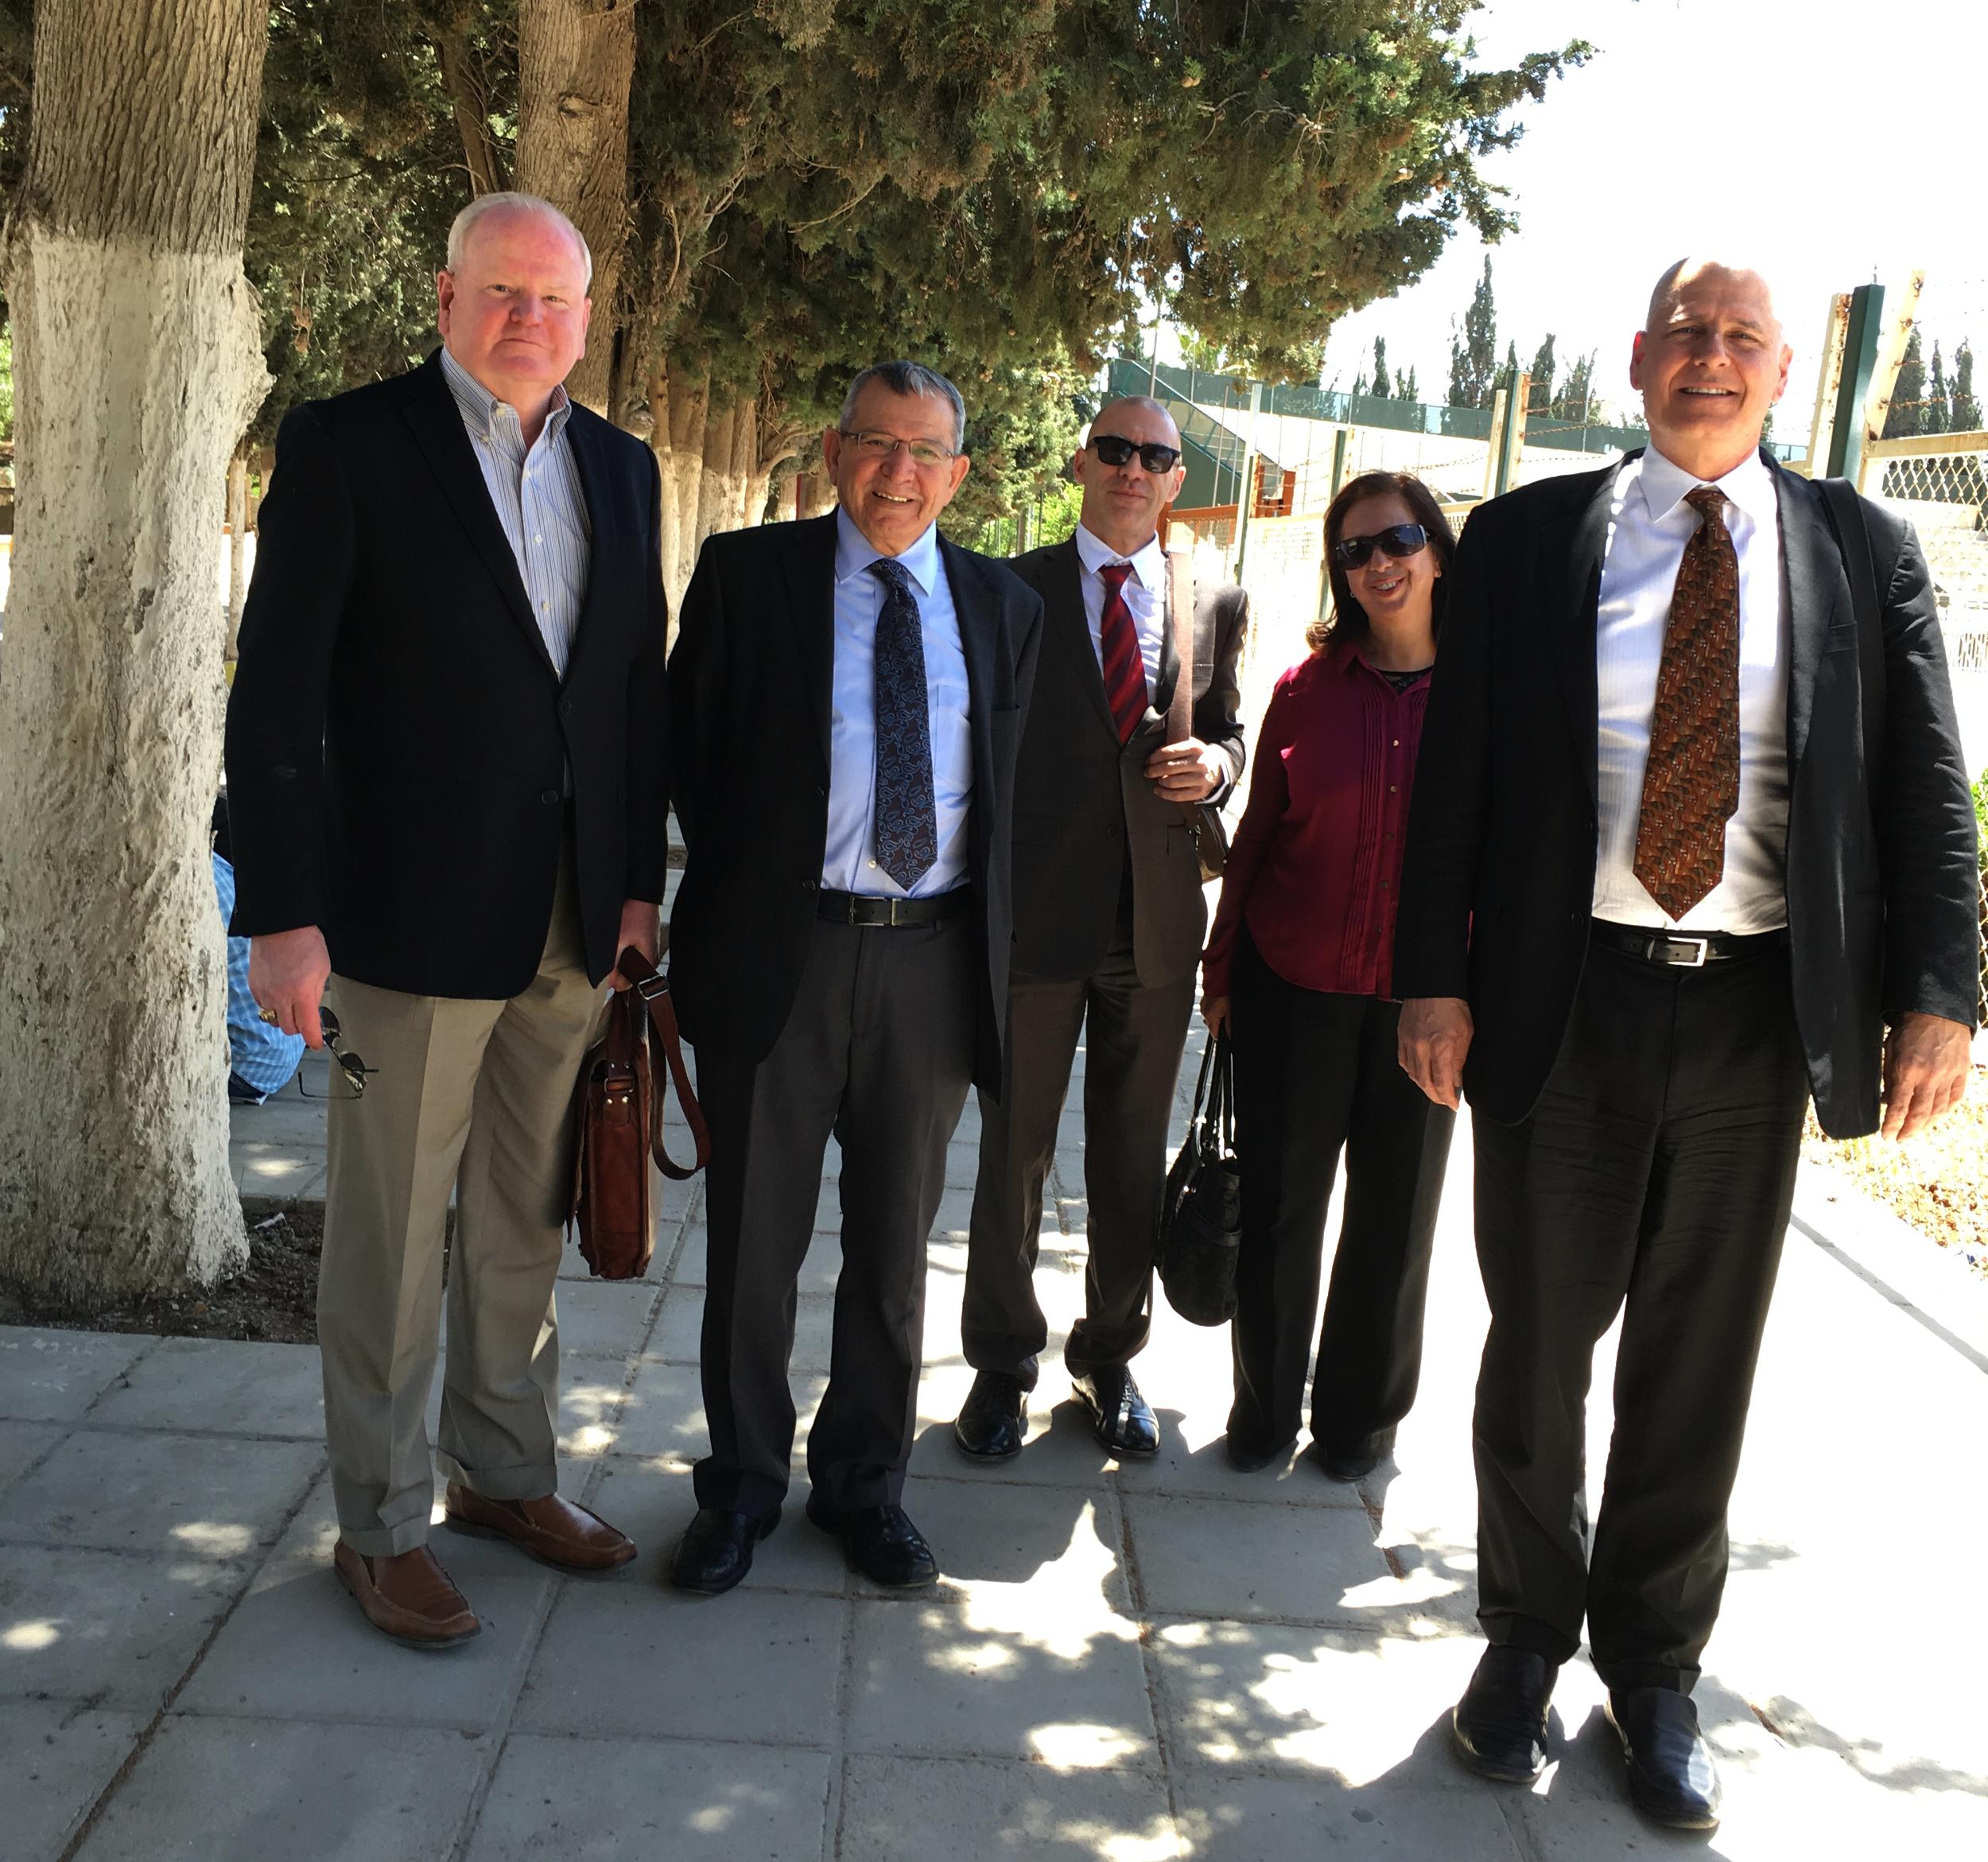 Maj Gen (Ret) Charles E. Tucker, Dr. Mahmoud Duwairi, Craig Coletta, Sawsan Alfayez, and Dr. Eric Woltertorff on the University of Jordan campus.